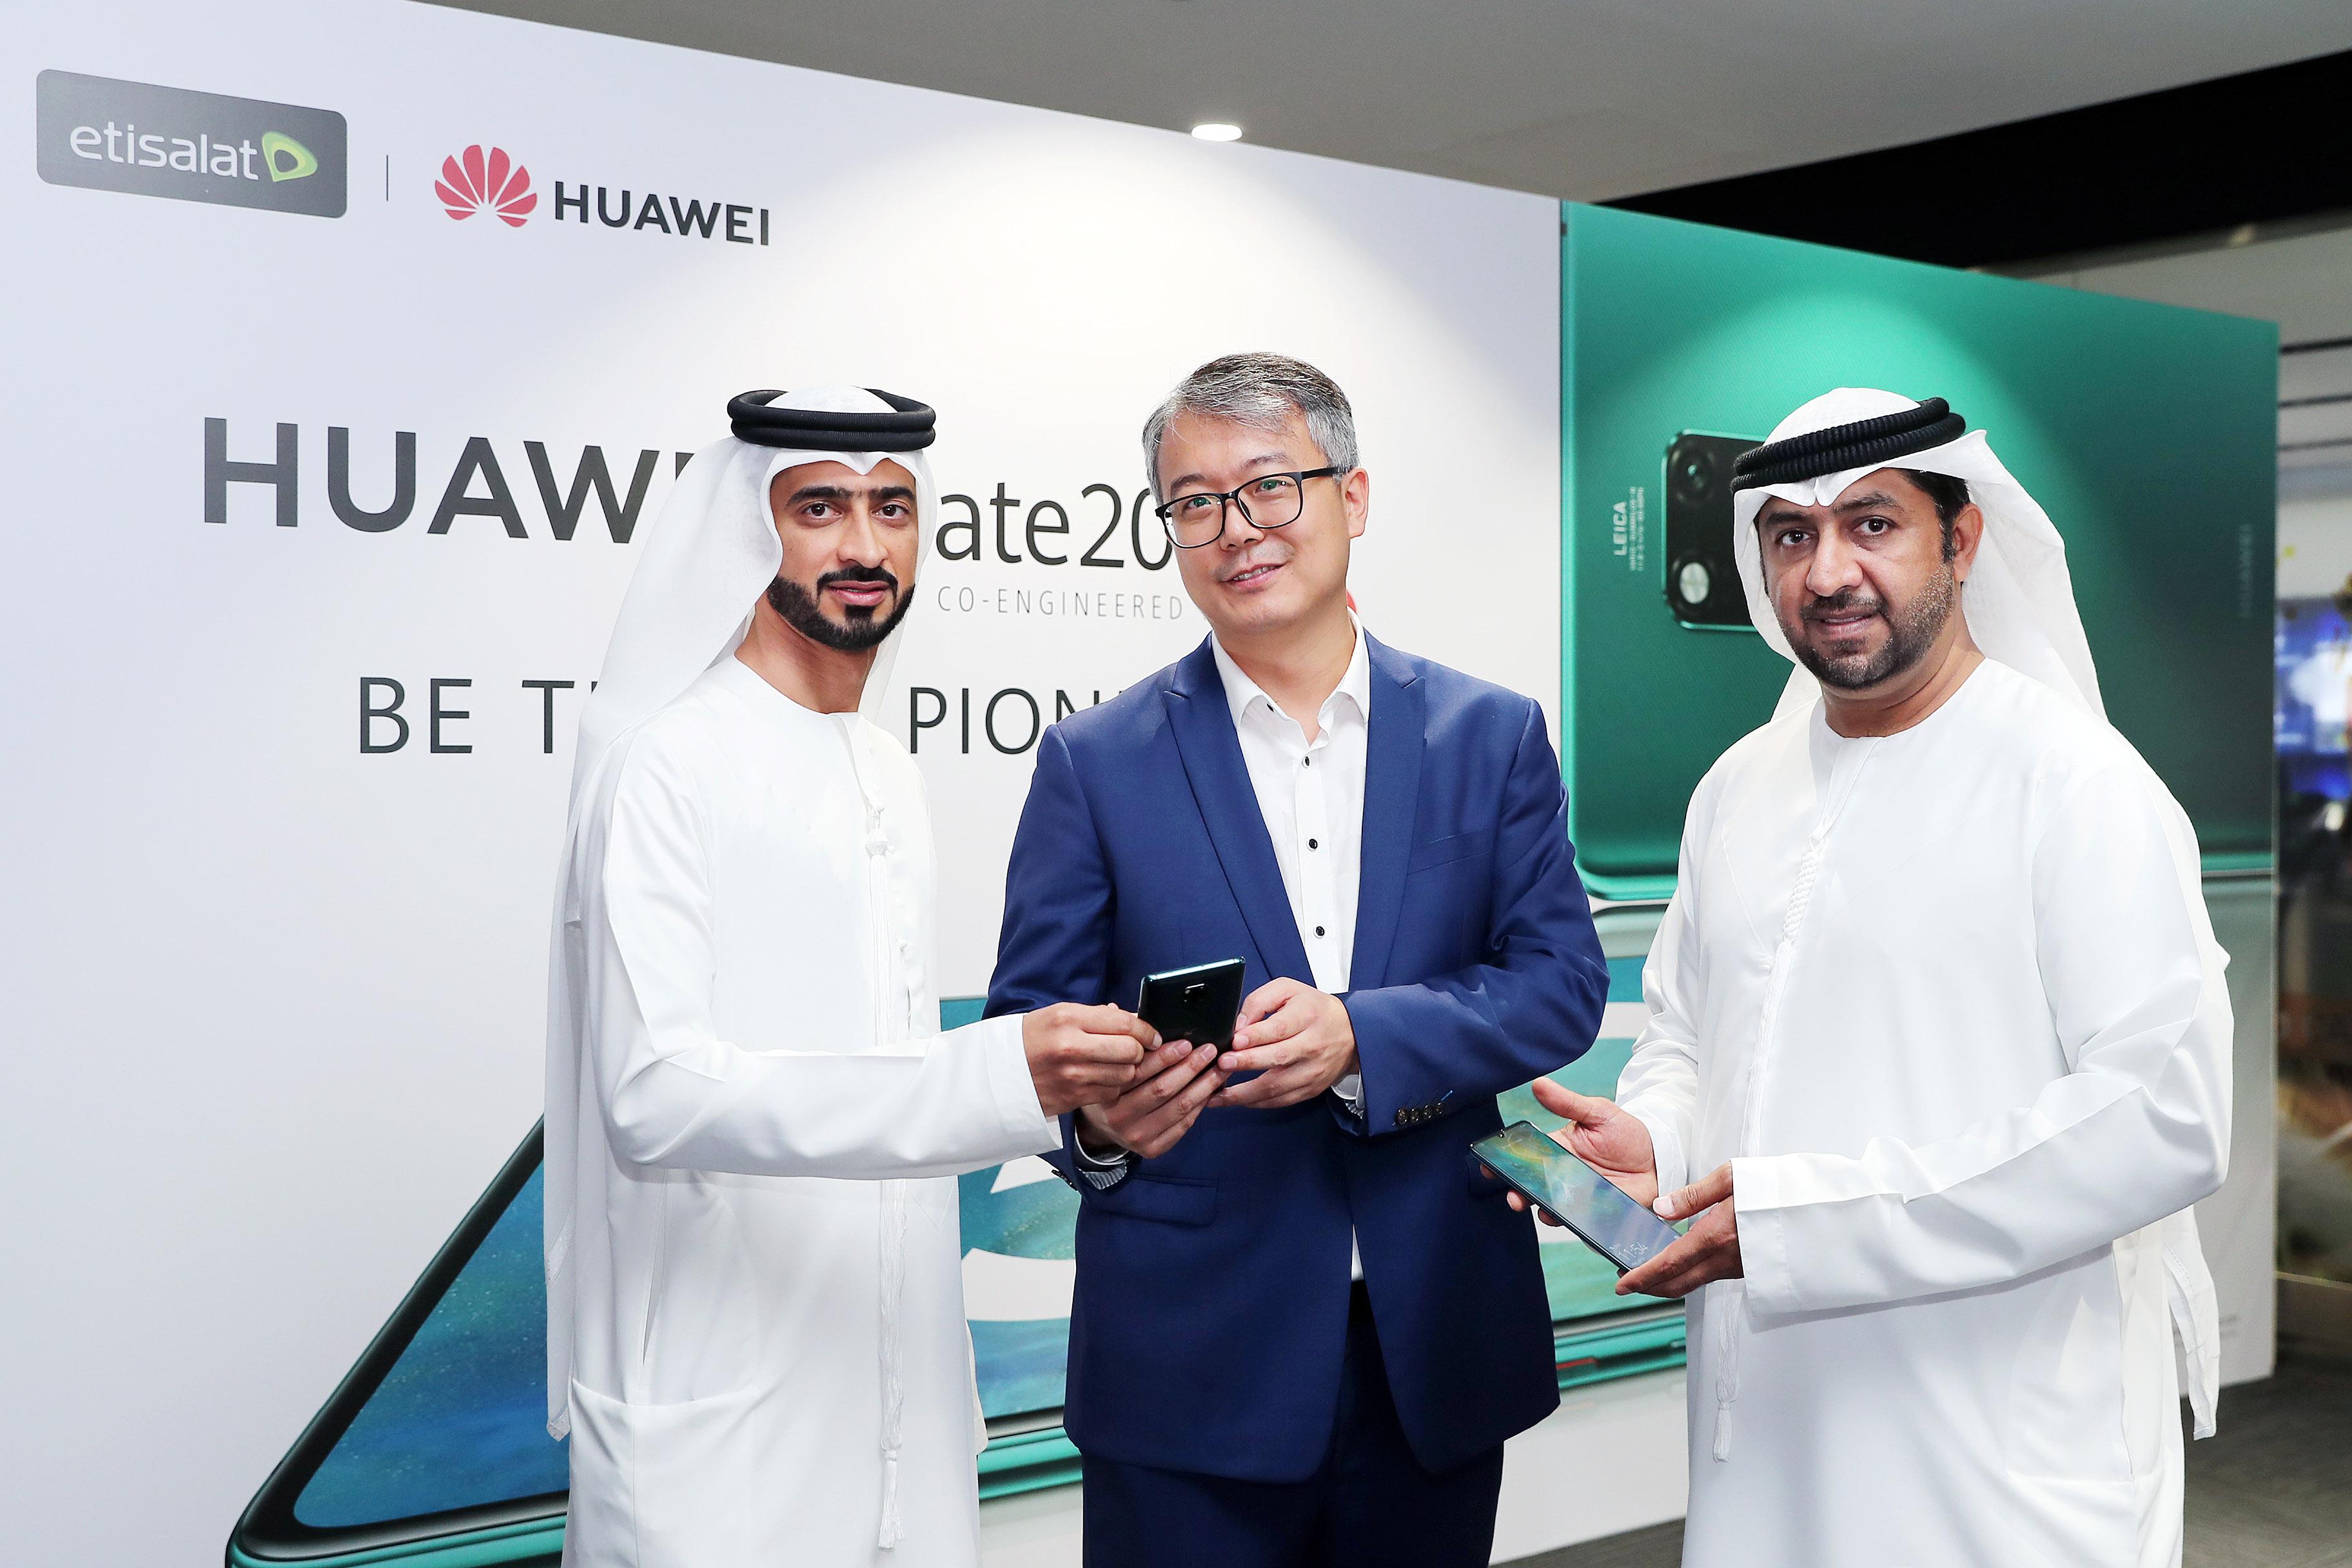 Etisalat and Huawei unveil HUAWEI Mate 20 X (5G)